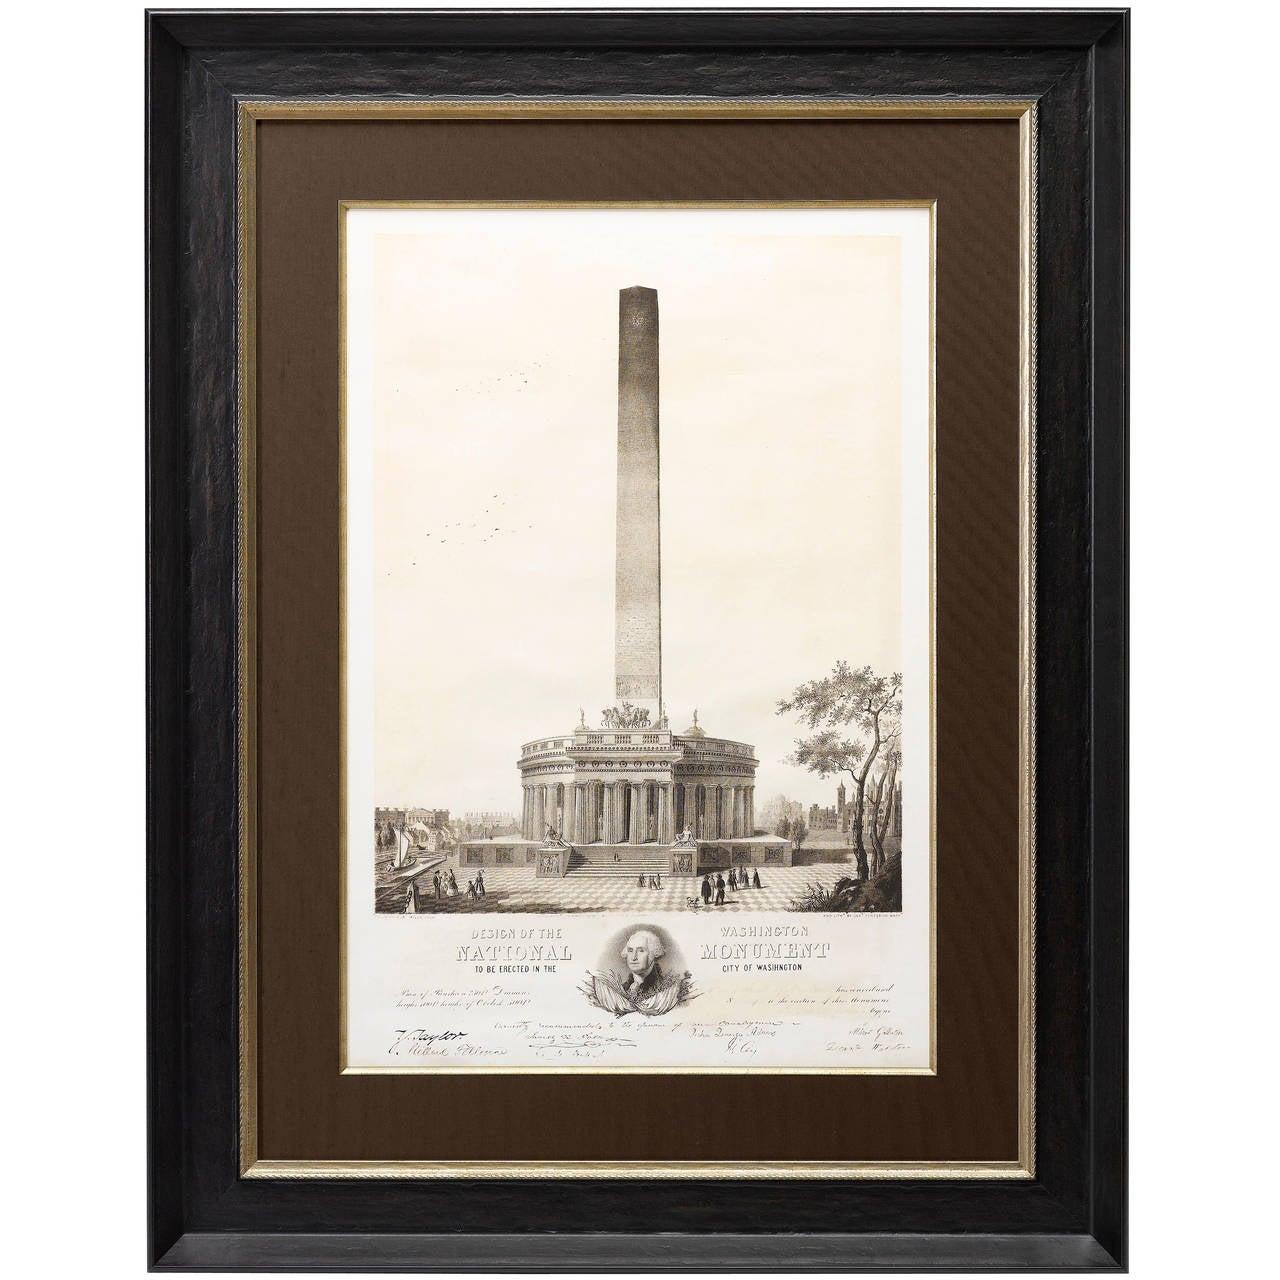 Design of the Washington National Monument, First Edition Print, circa 1846